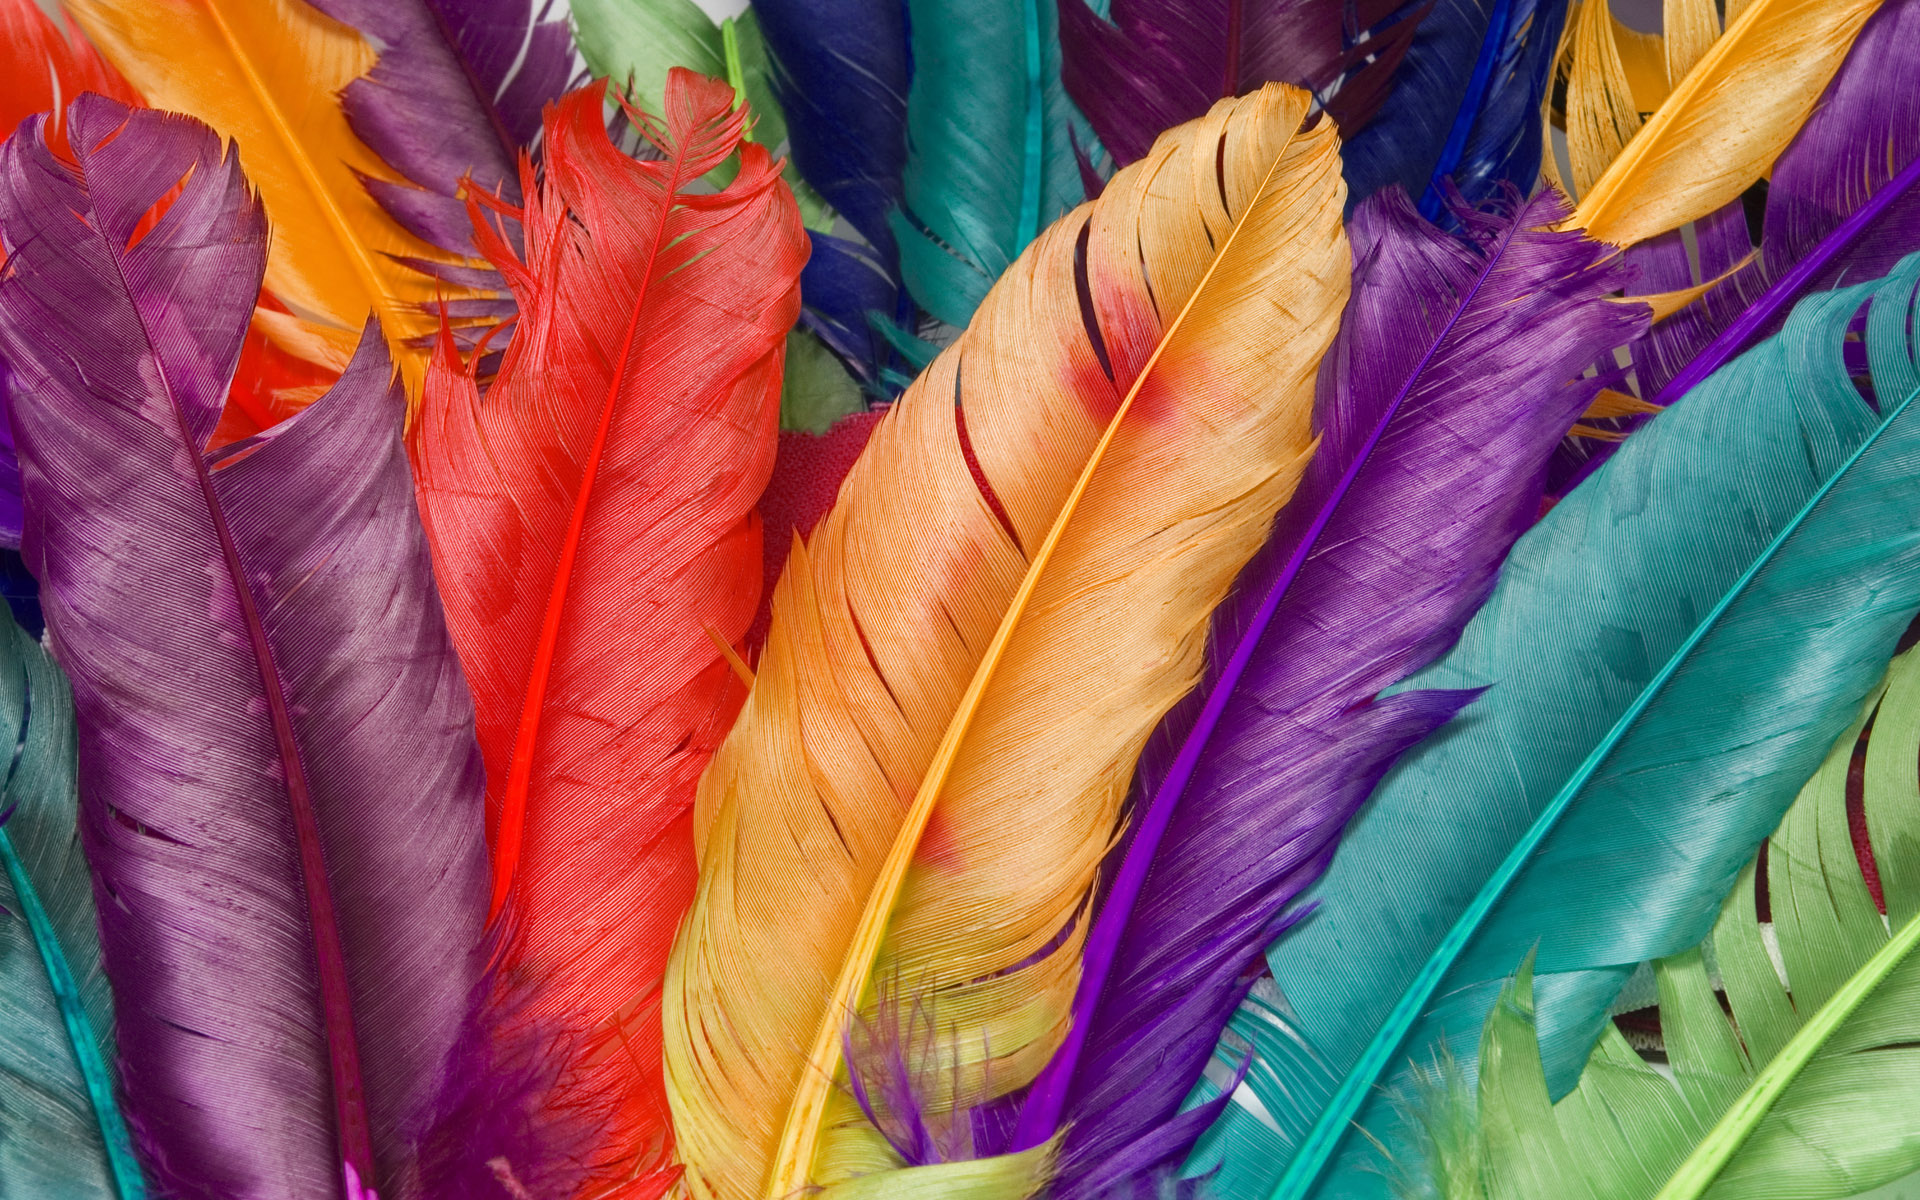 colorful hd wallpaper for desktop